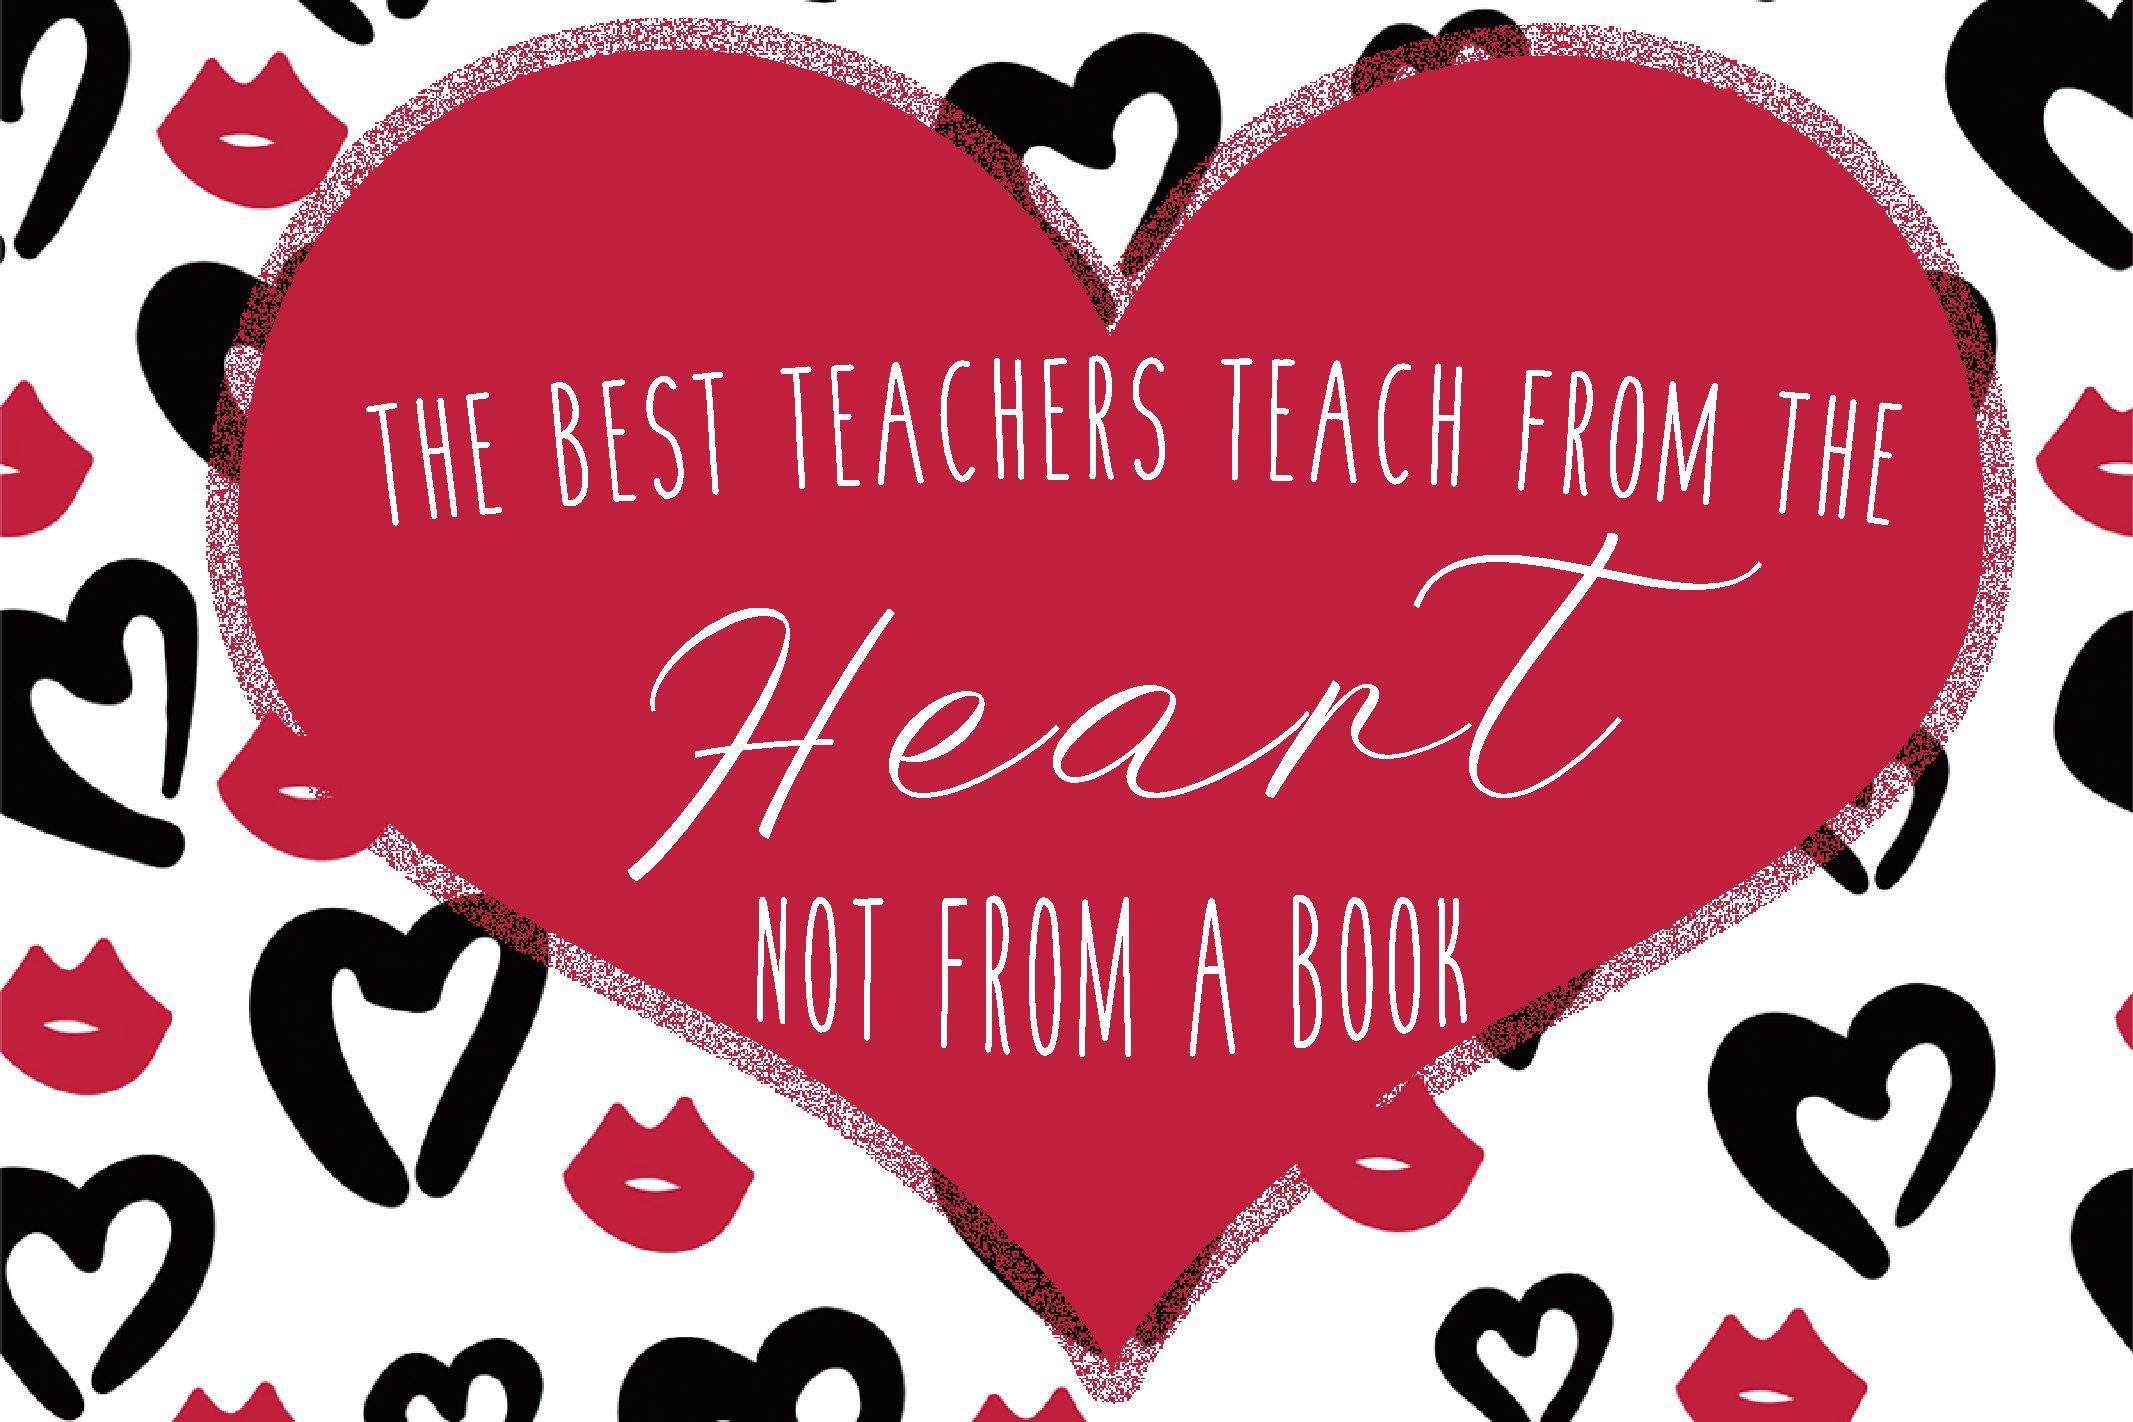 photograph regarding Teacher Valentine Printable called Do-it-yourself Mason Jar Reward for Instructors Excellent for Valentines Working day